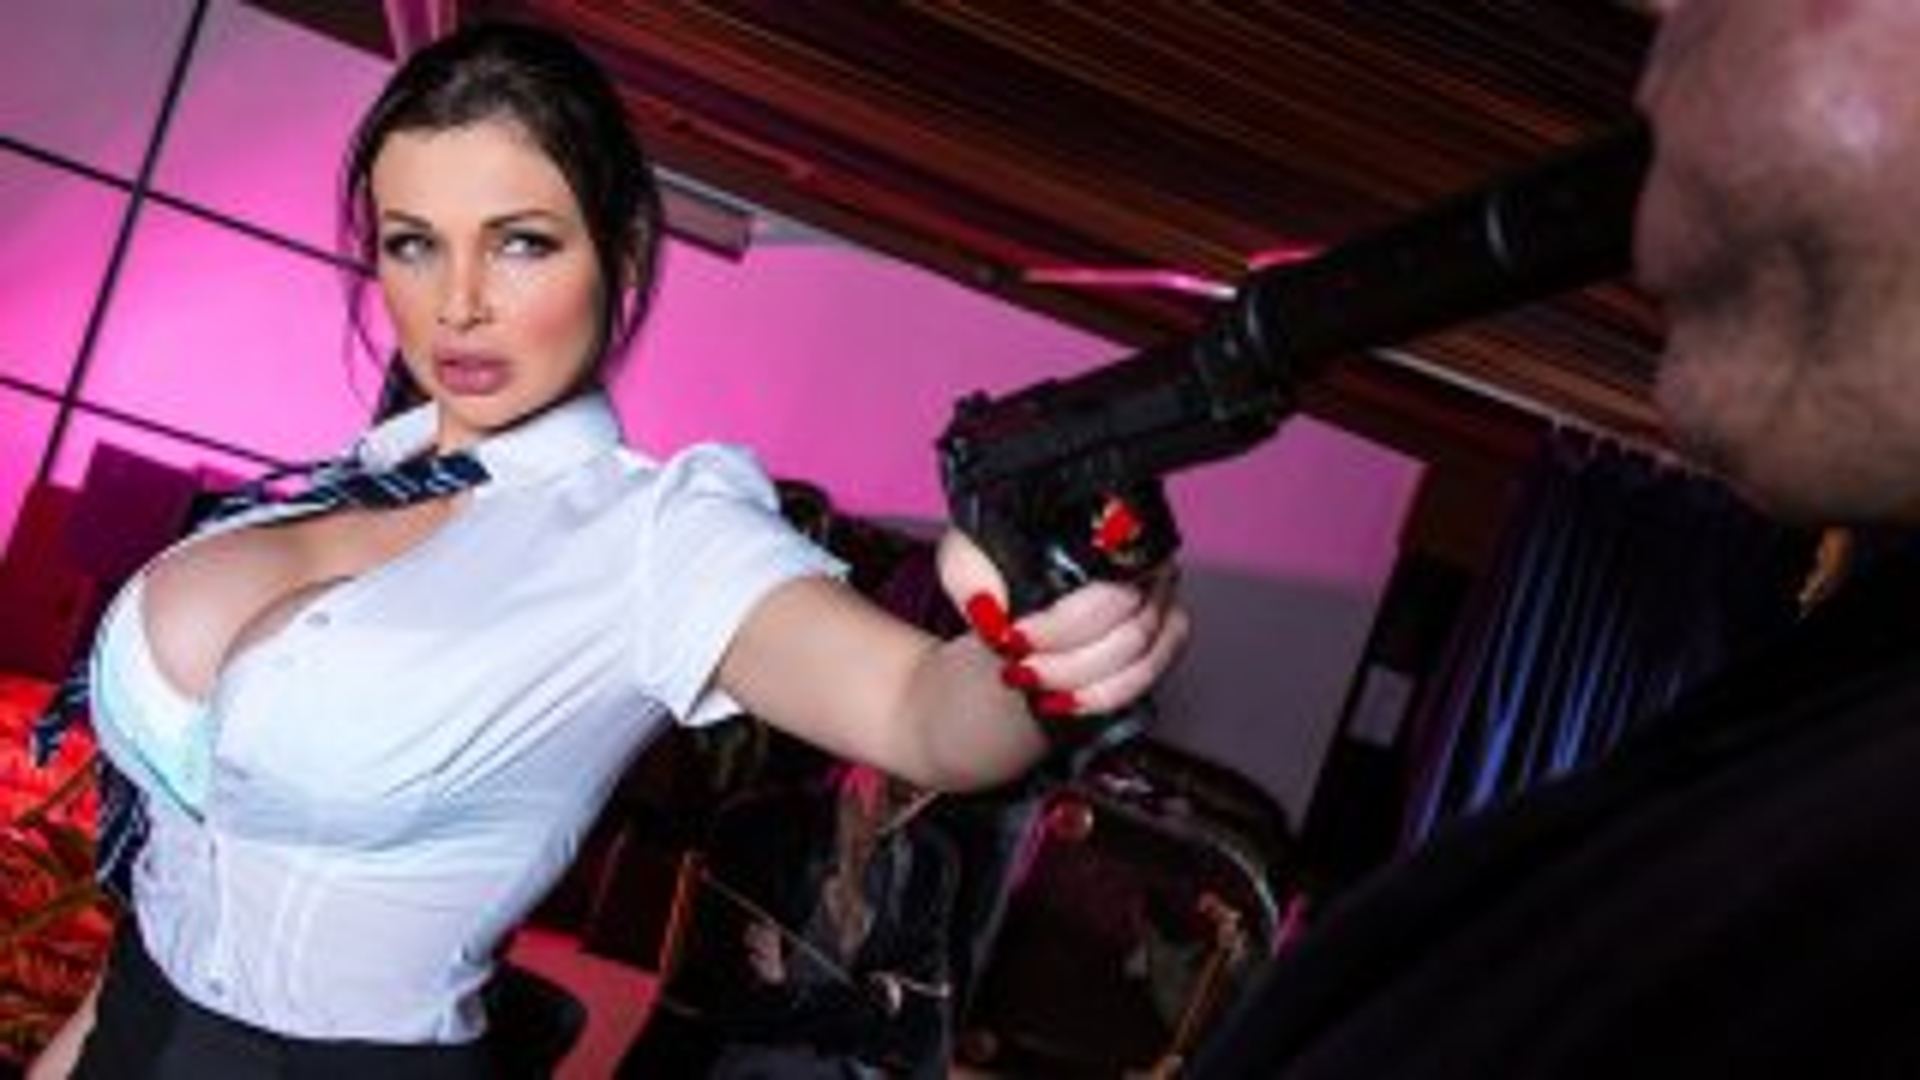 Spy Hard 3: Hit Girl - Big Tits At School